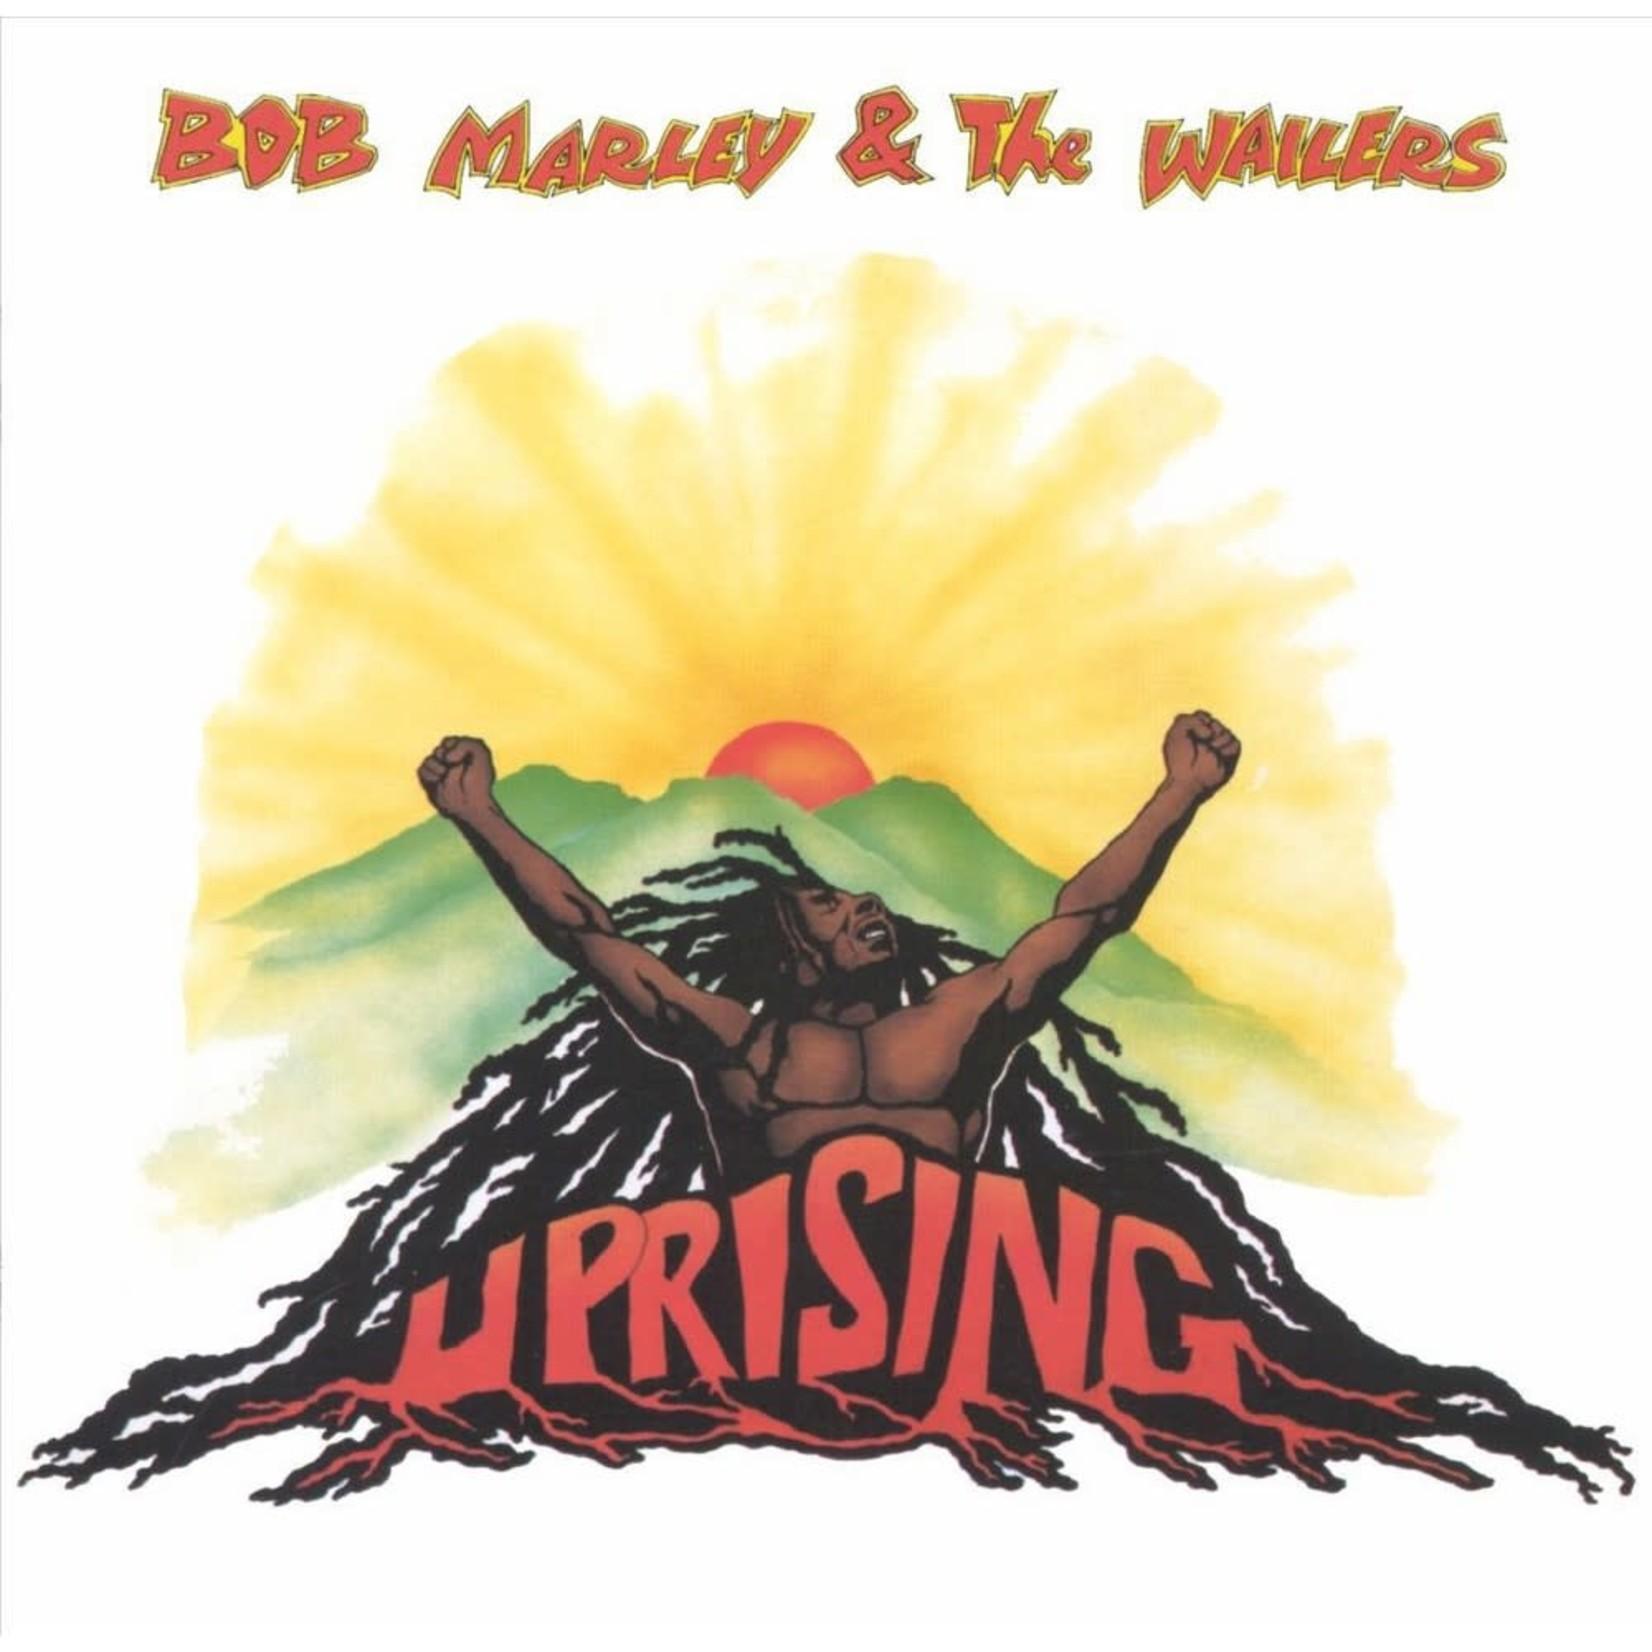 [New] Marley, Bob: Uprising